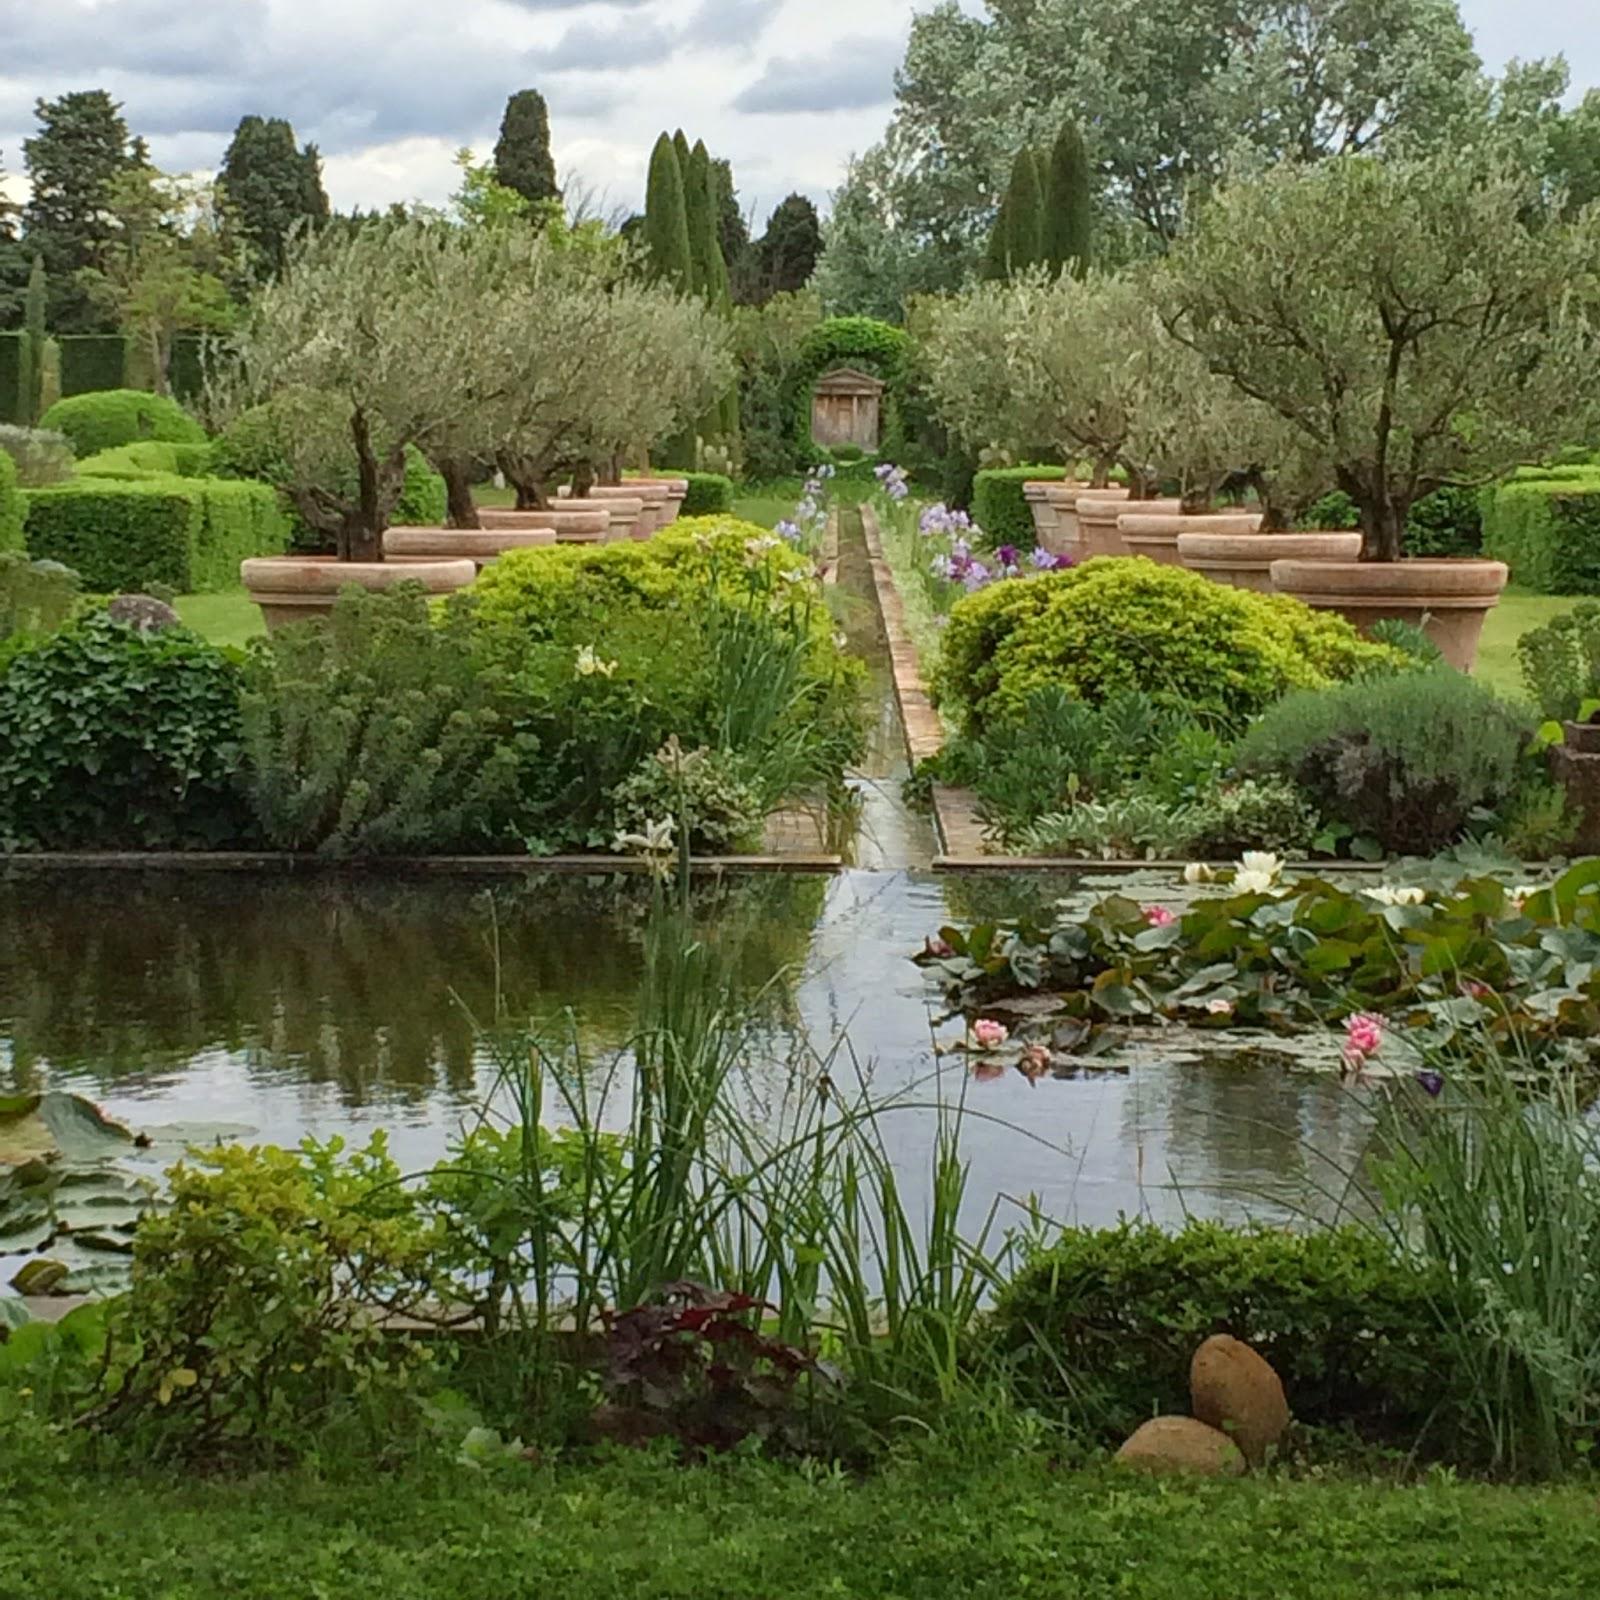 Archivert nimes archivert nimes sarl paysagiste sur for Prix entretien jardin